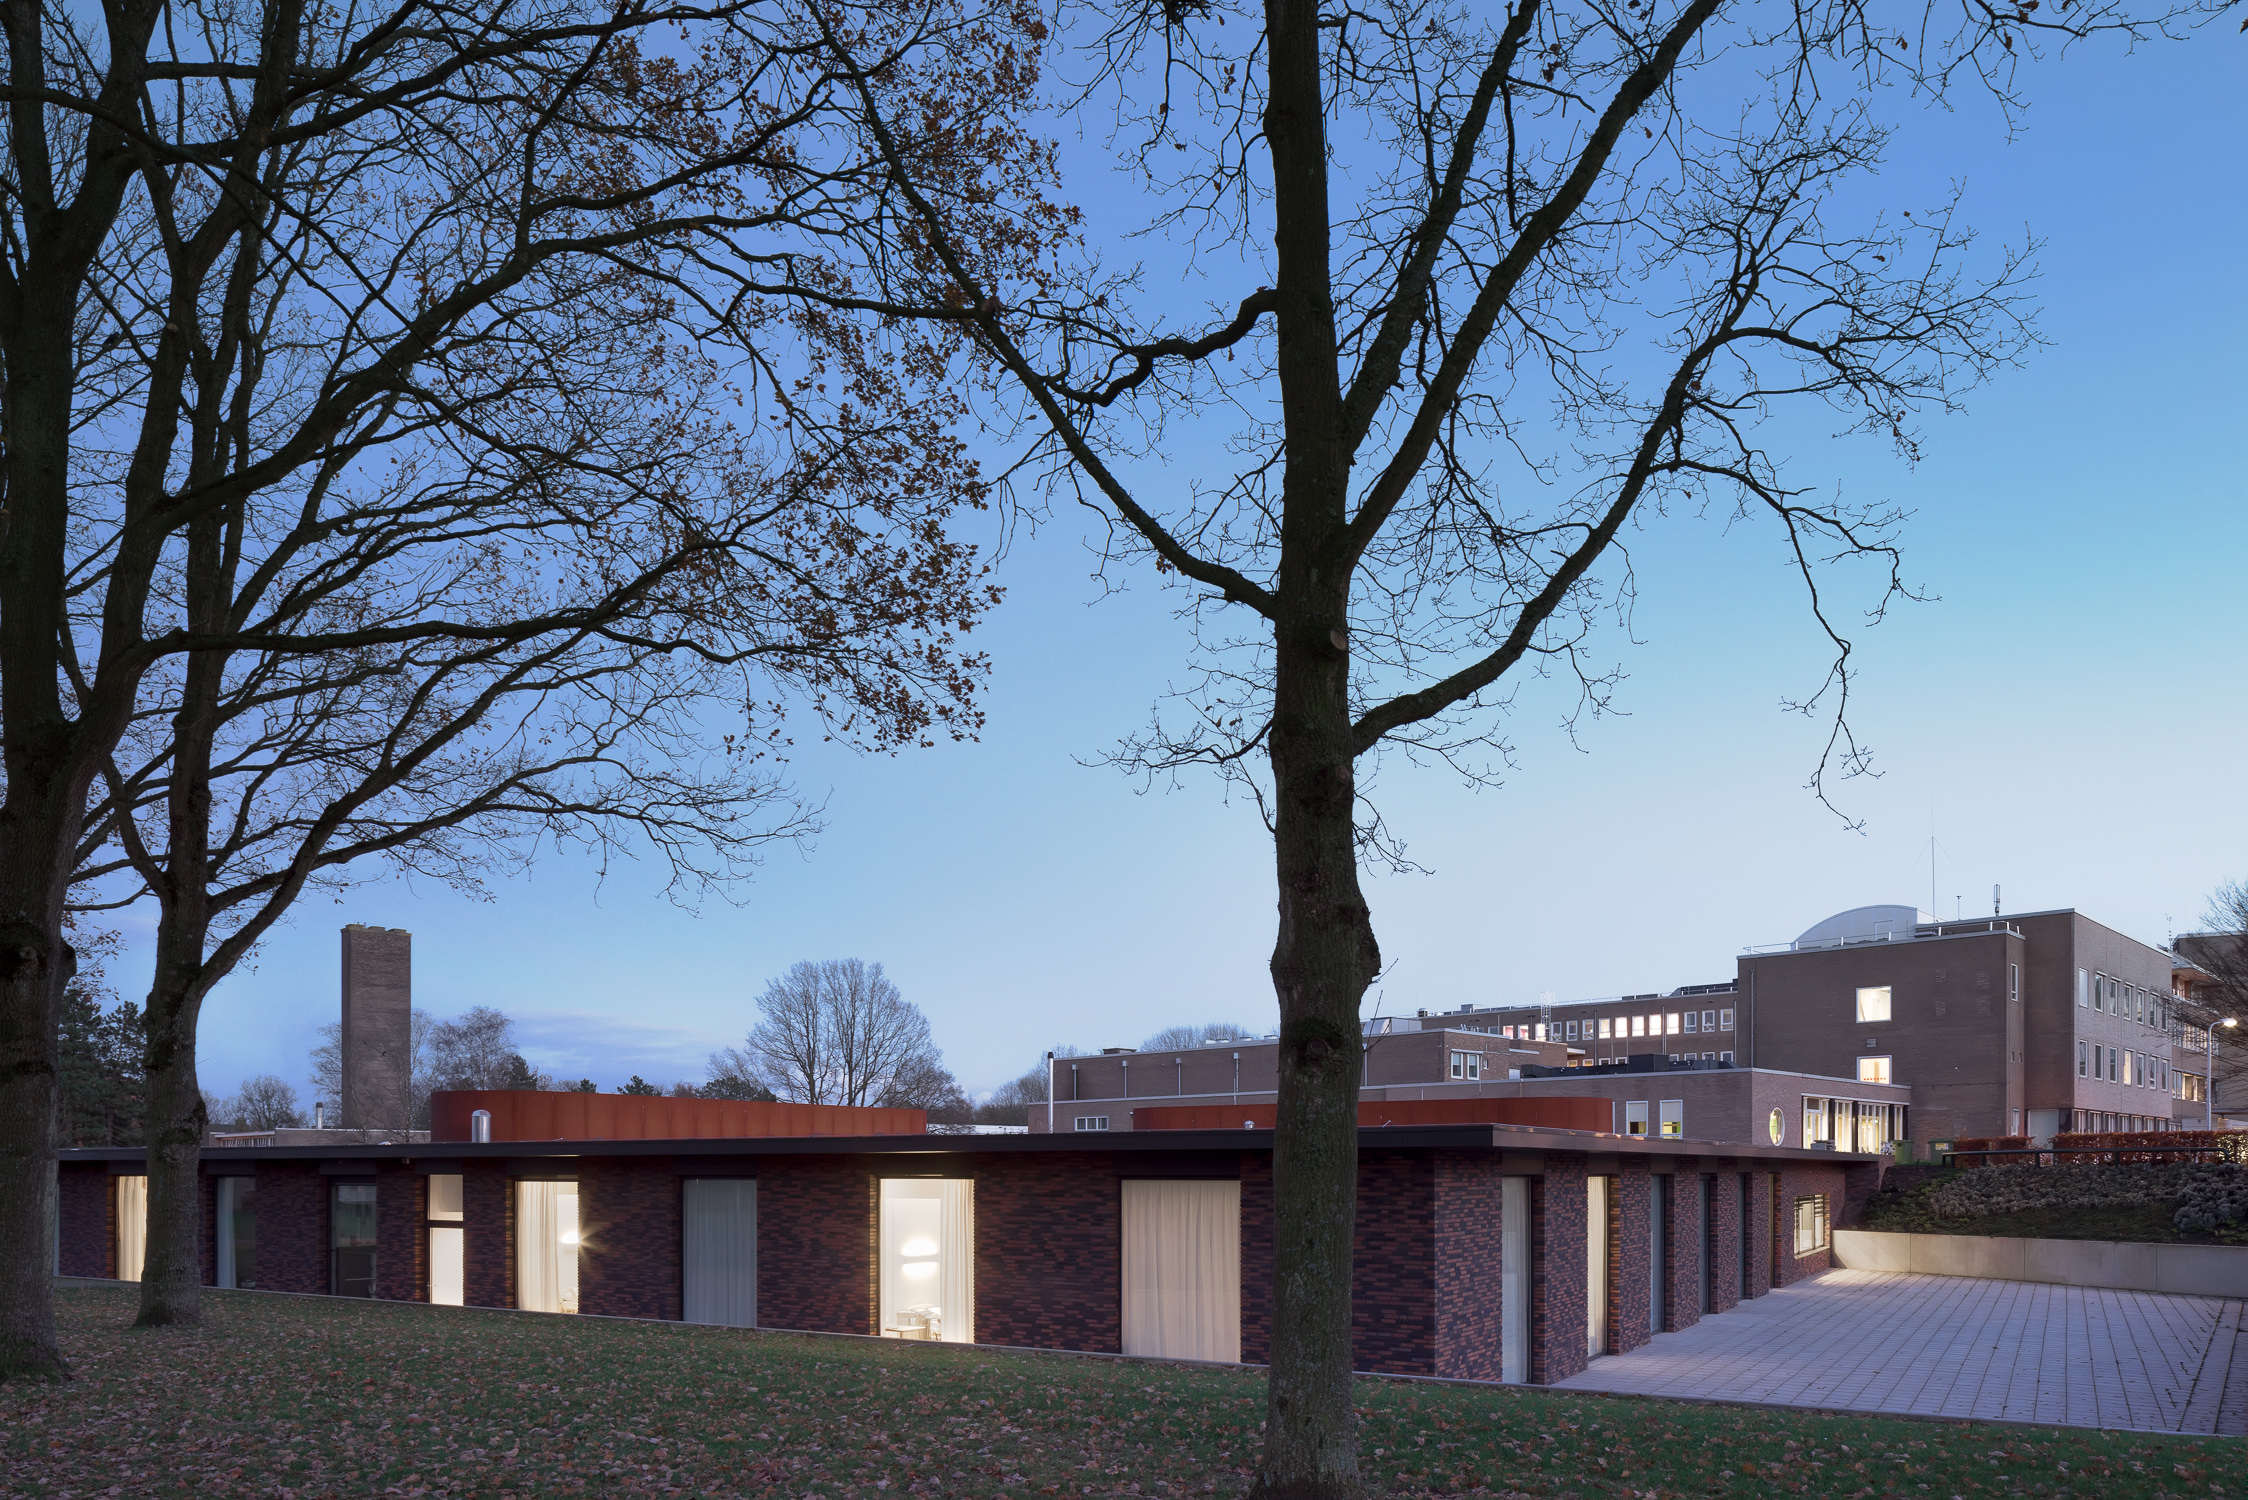 team-4-groningen-haren-beatrixoord-mark-hadden-amsterdam-architecture-photographer-architectuurfotograaf-078.jpg